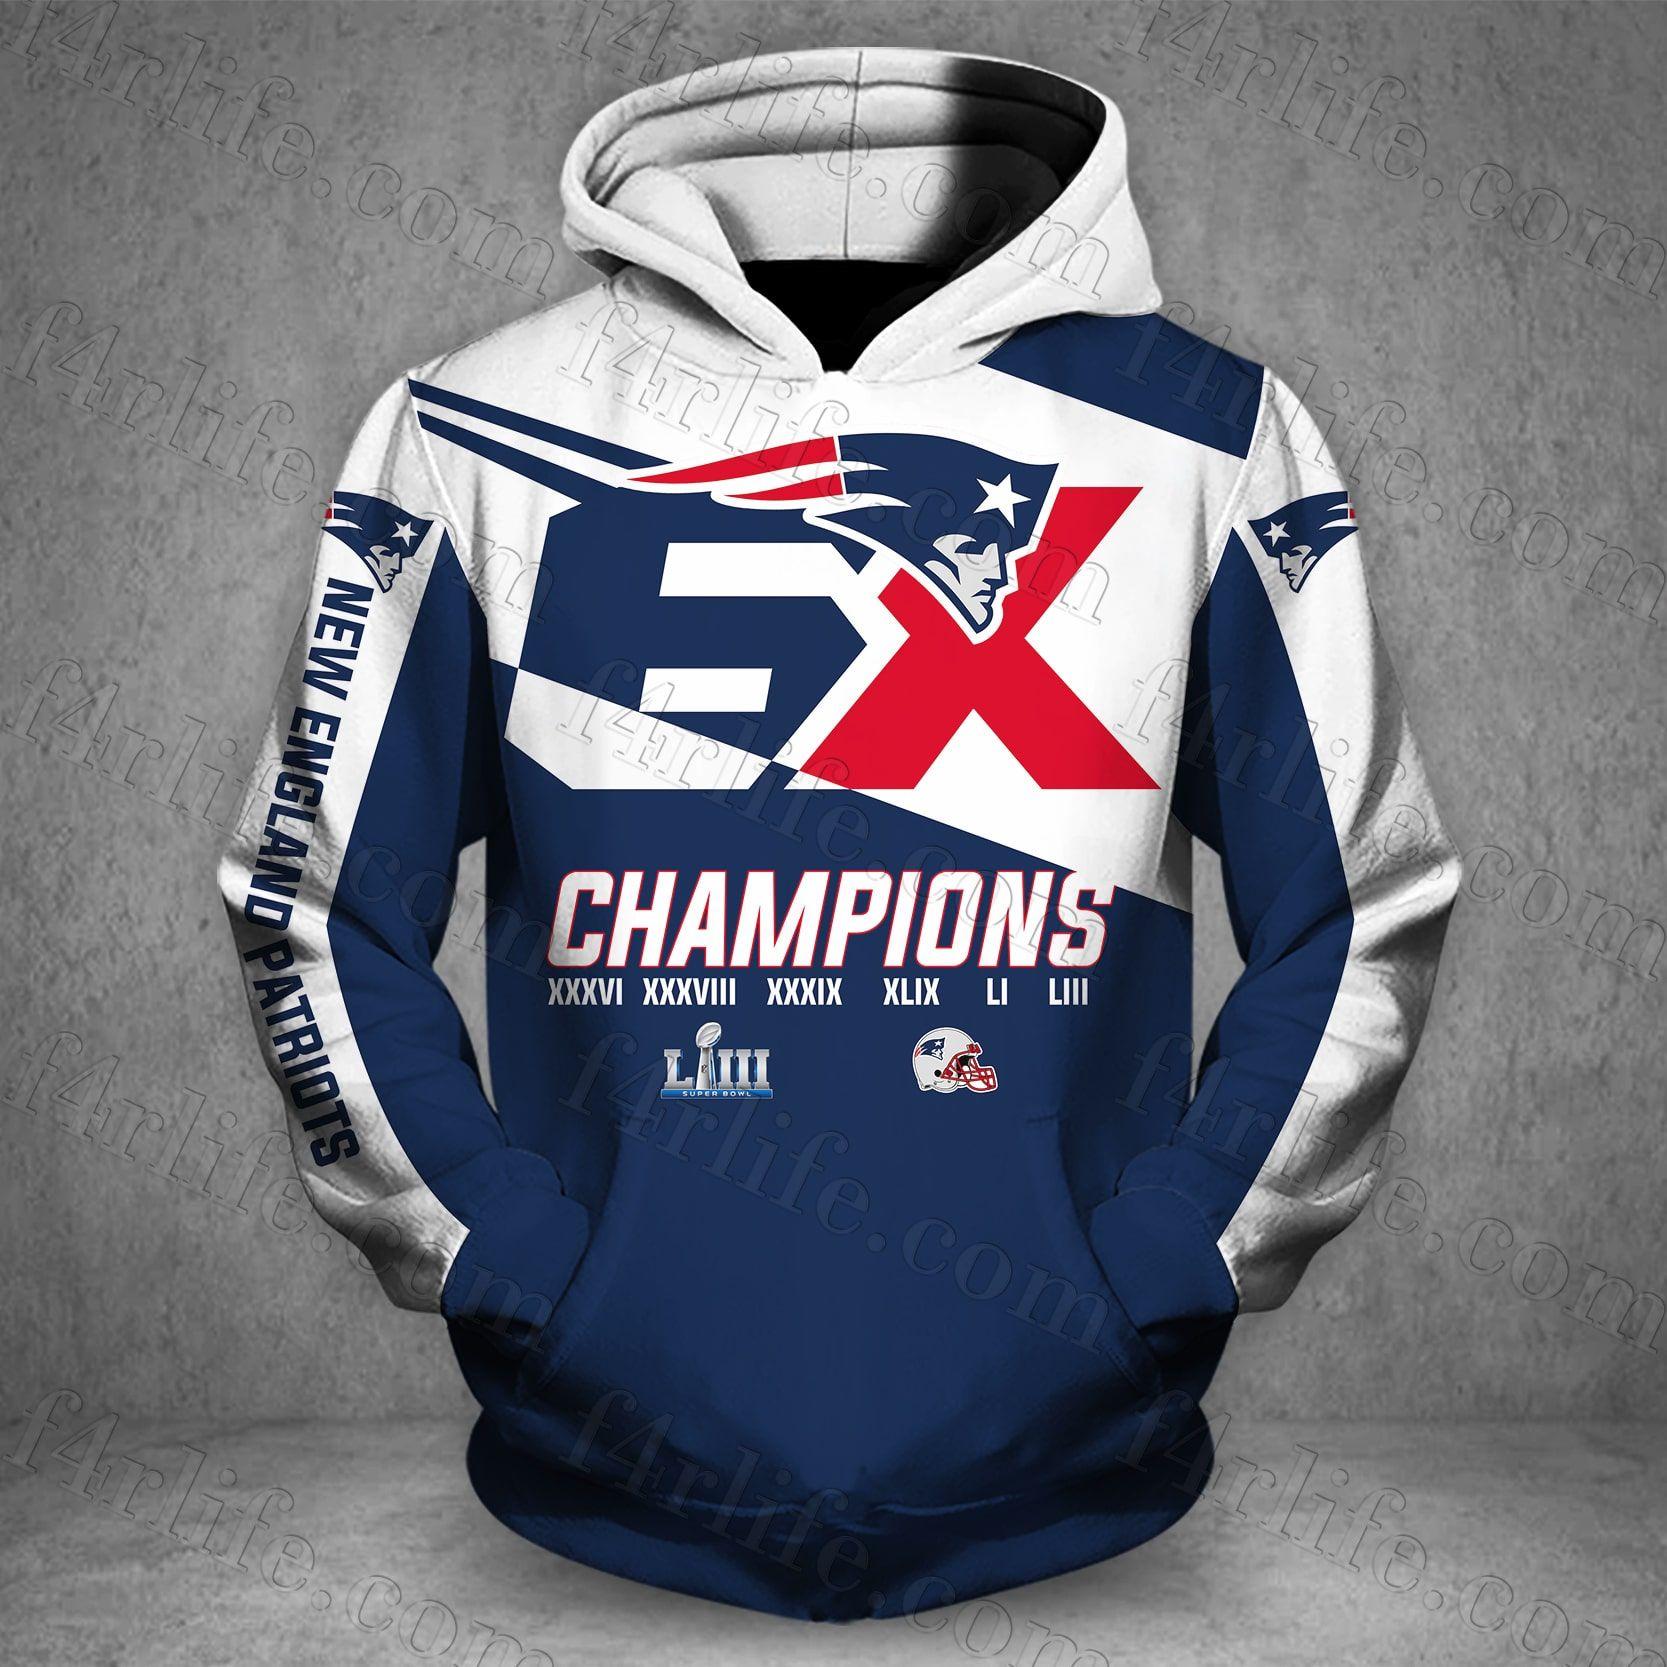 Men Women New Design New England Patriots Super Bowl Champions 3d Hoodie Hoodie For Patrio New England Patriots New England Patriots Hoodie Patriots Fans